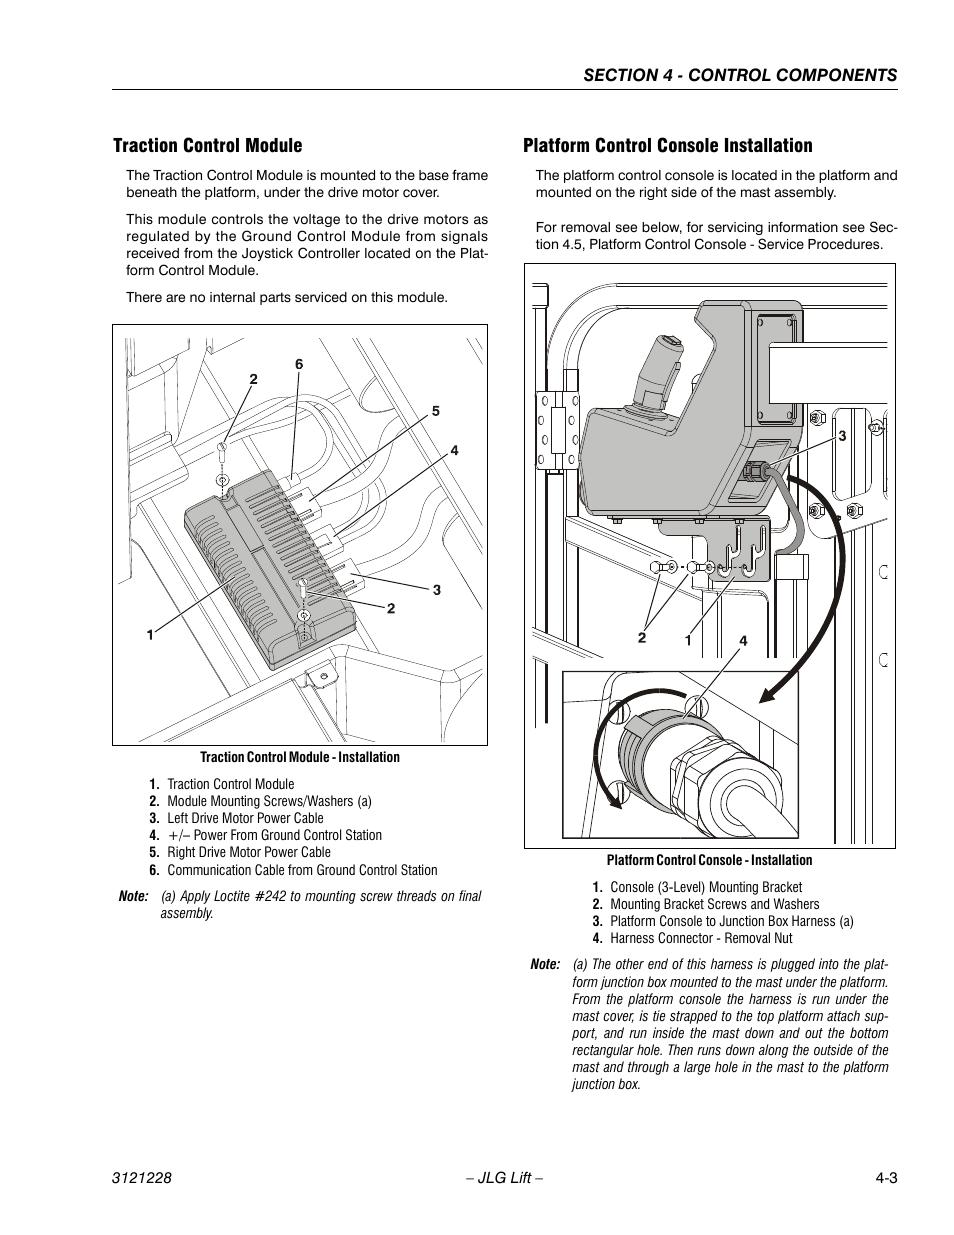 Traction control module platform control console installation jlg traction control module platform control console installation jlg 10msp service manual user manual publicscrutiny Choice Image